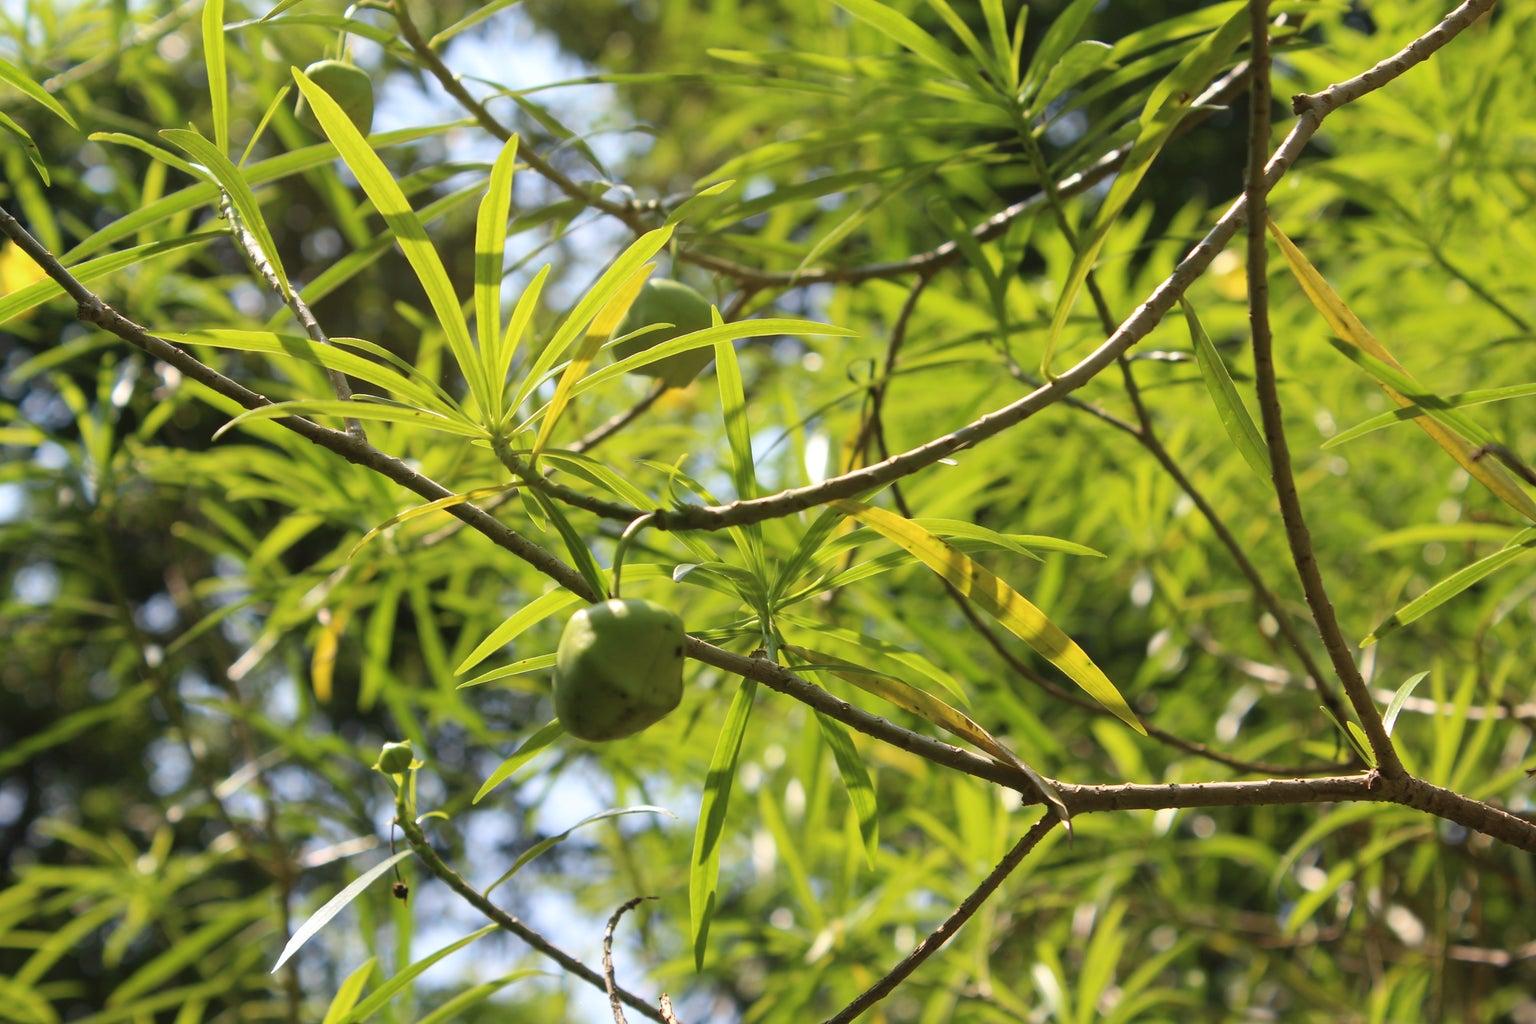 Kaner (Yellow Oleander):